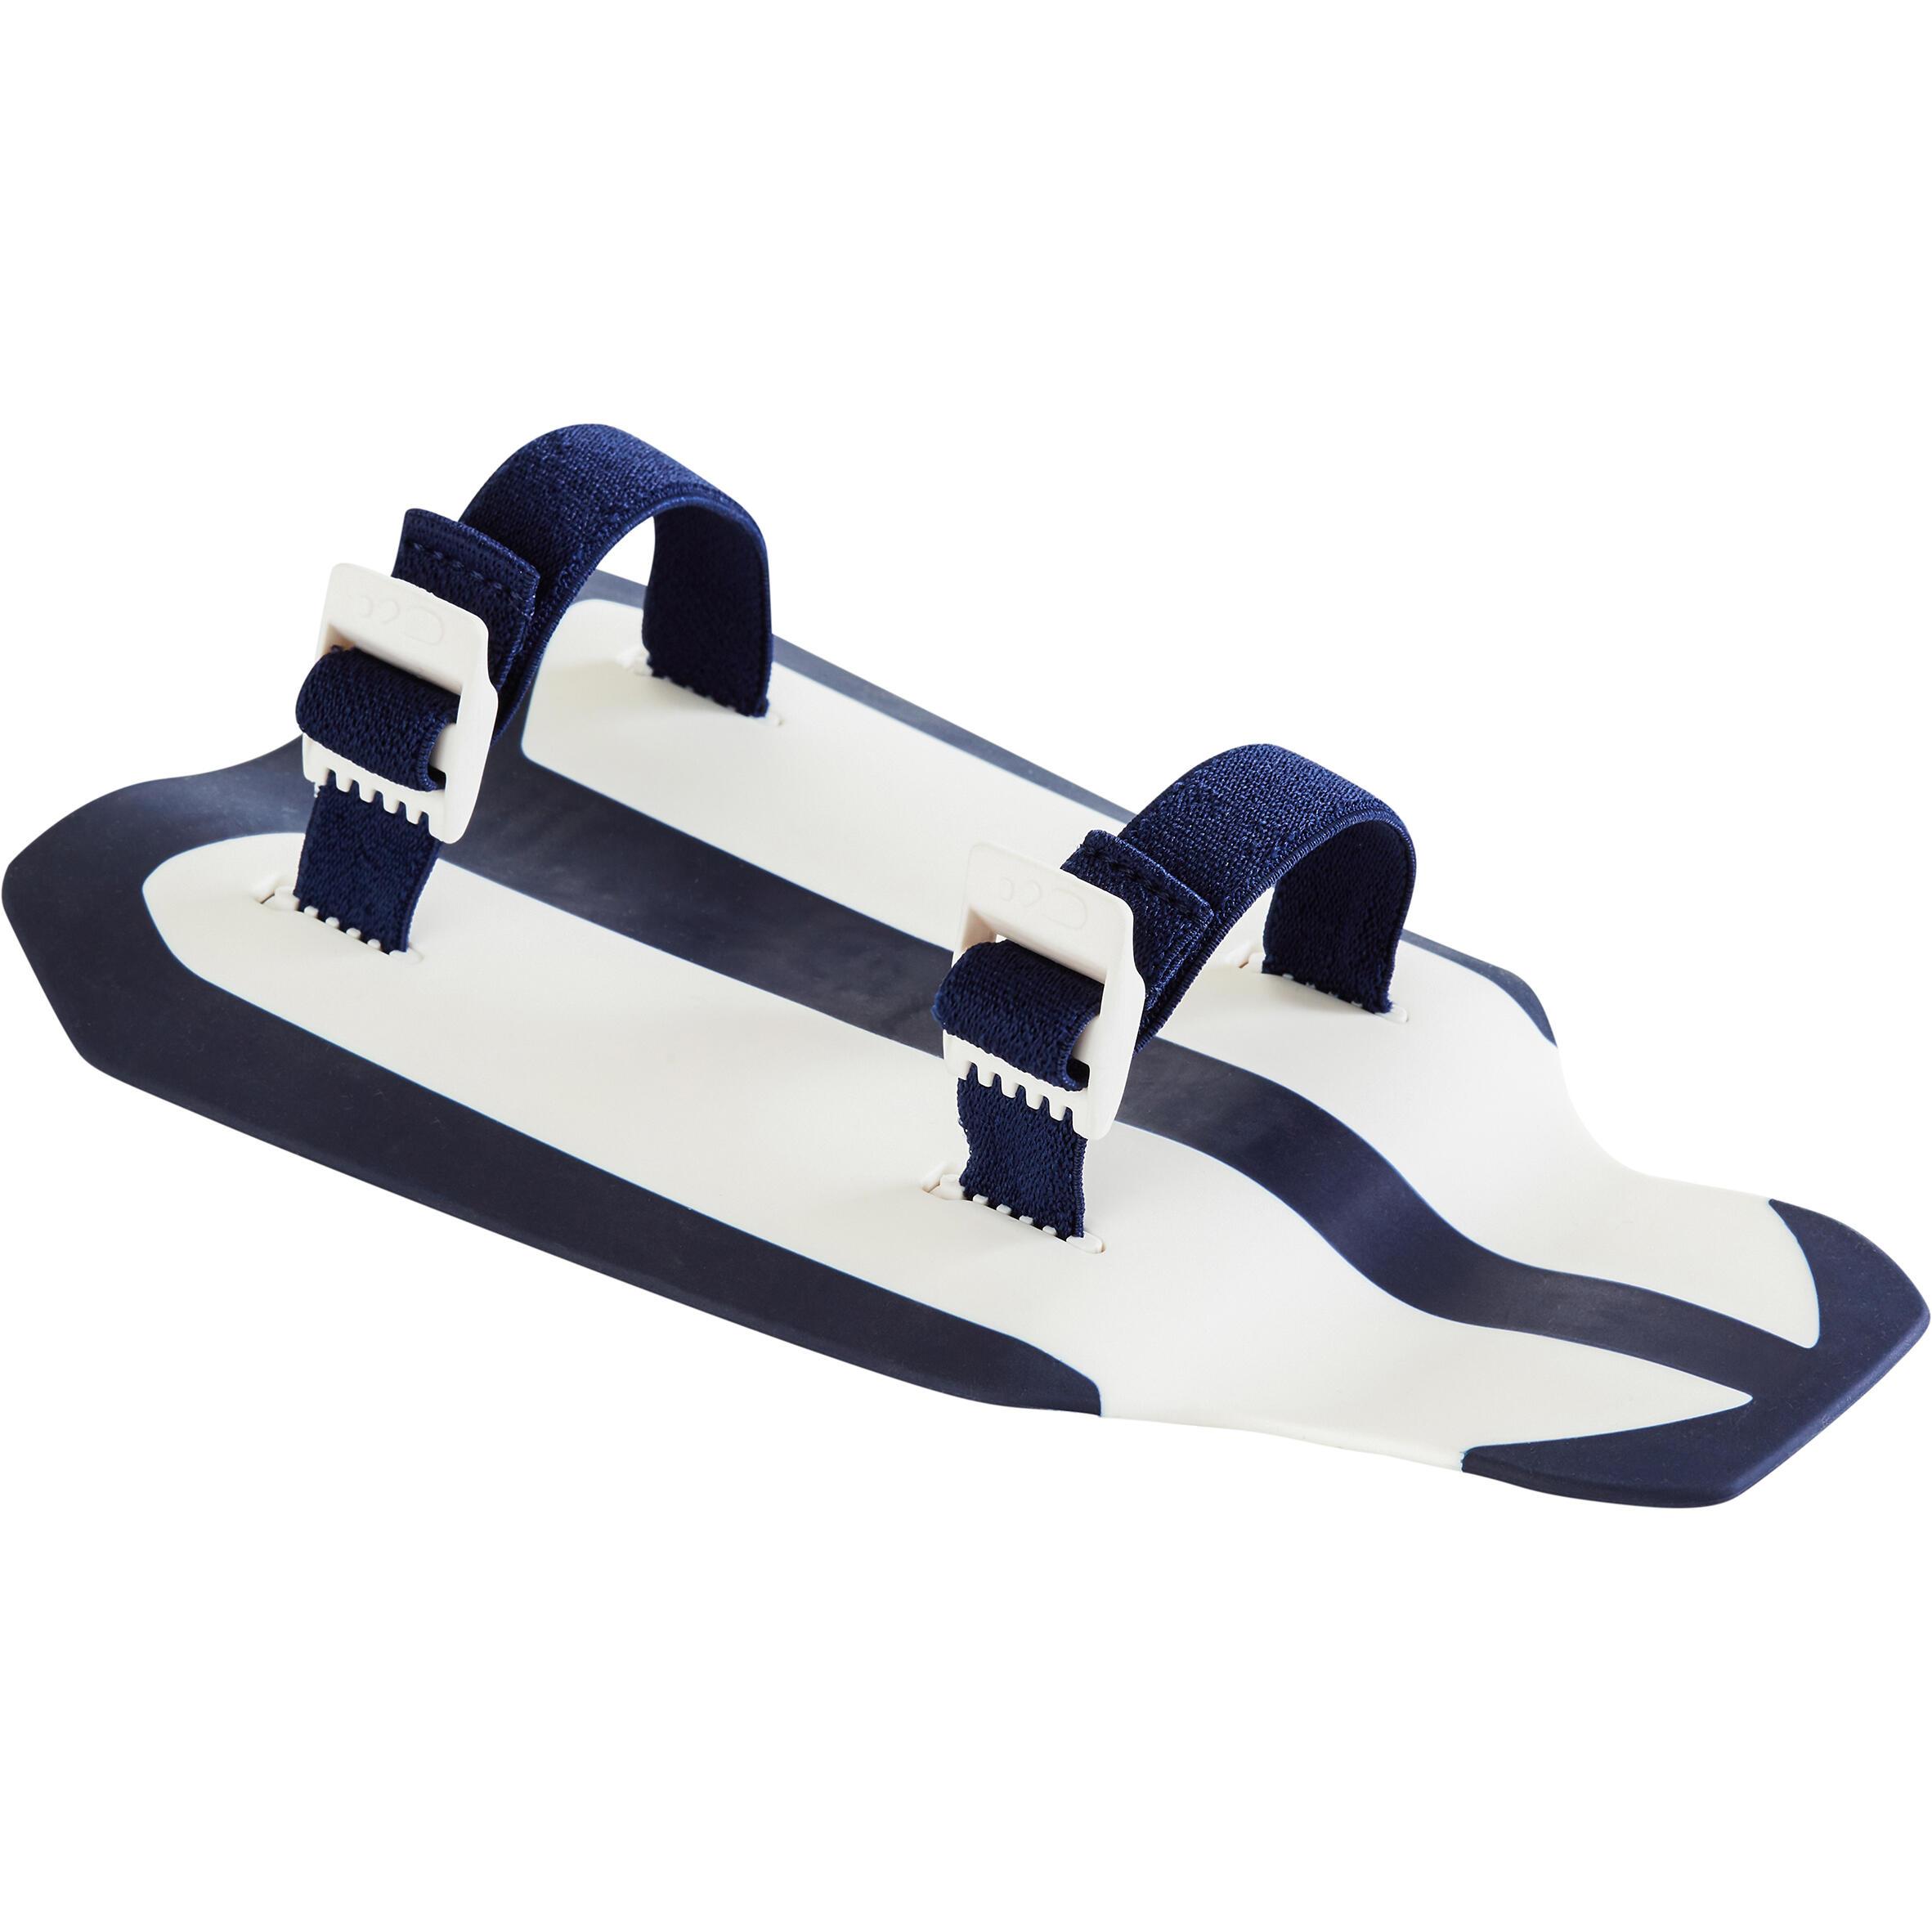 Nabaiji Easystroke Swimming Hand Paddles - White Dark Blue